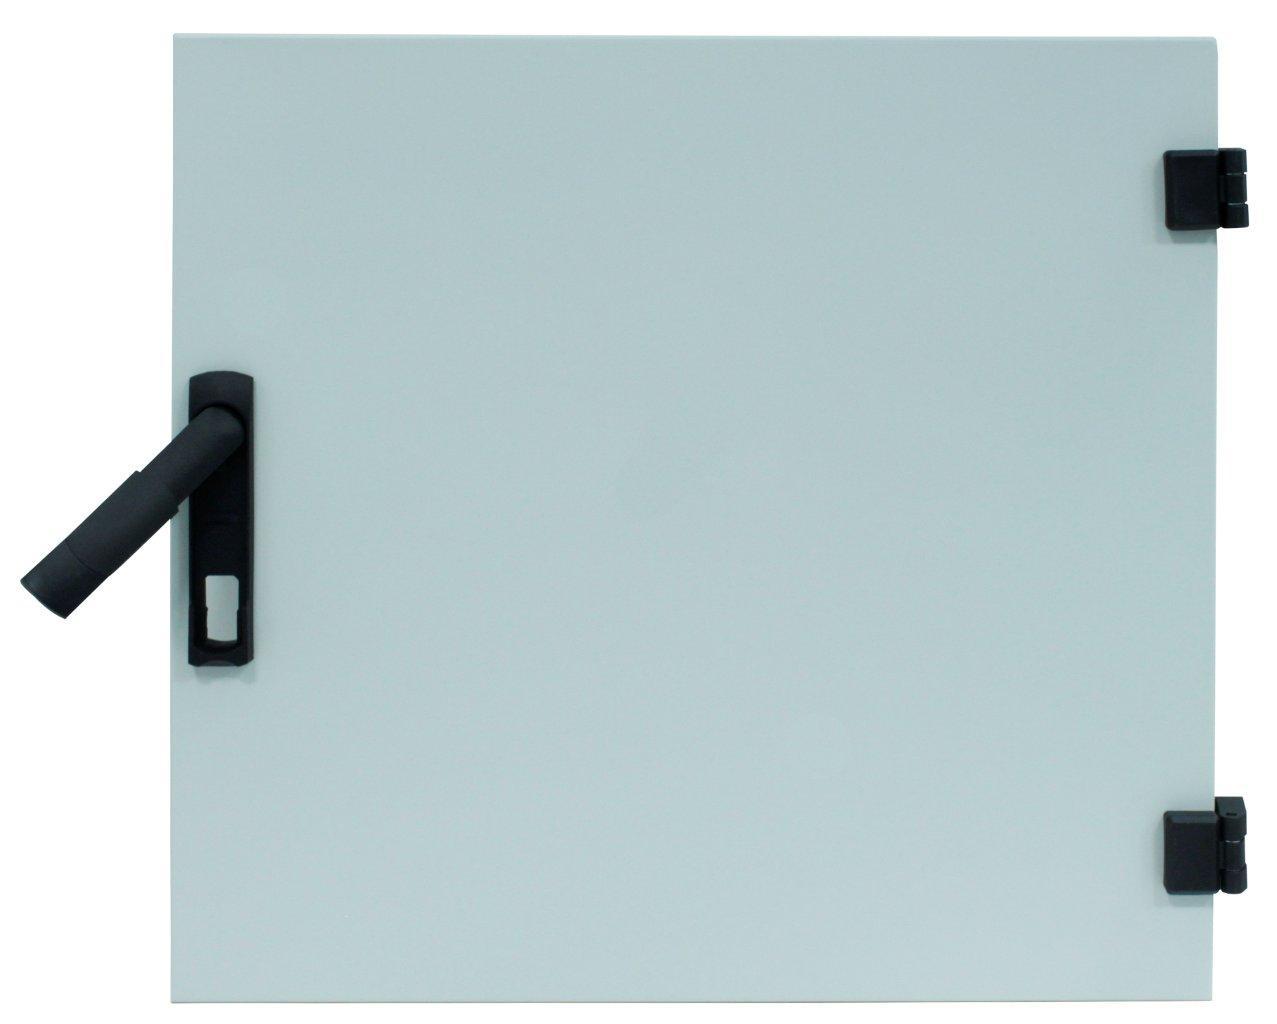 1 Stk Vollmetall-Tür f.DW-Schrank 6HE,B600,RAL7035,HZ-Vorbereitung DWRT0666--